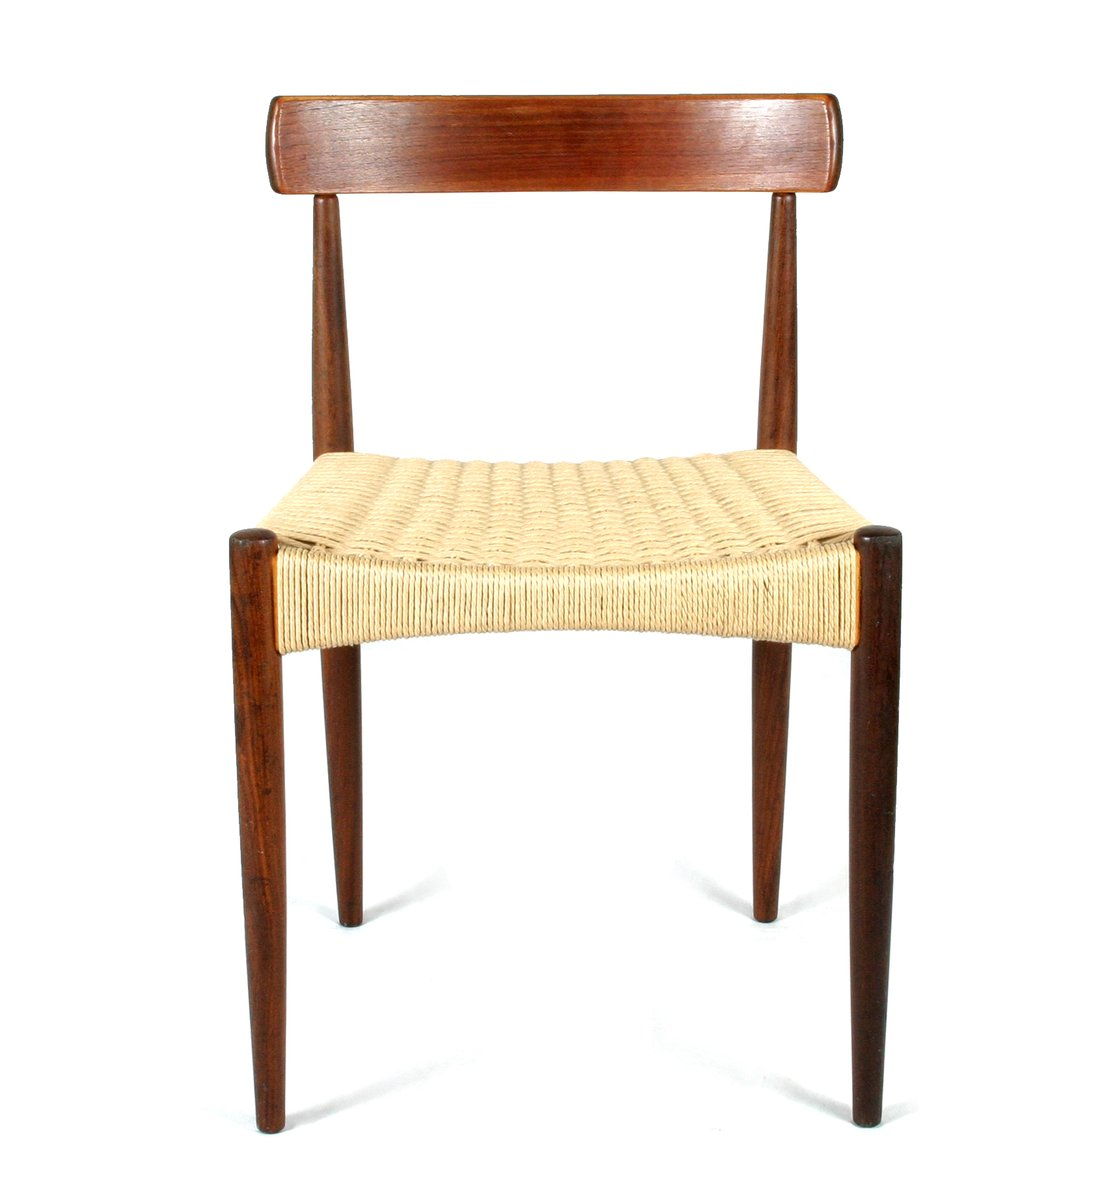 skandinavischer mid century stuhl von arne hovmand olsen. Black Bedroom Furniture Sets. Home Design Ideas